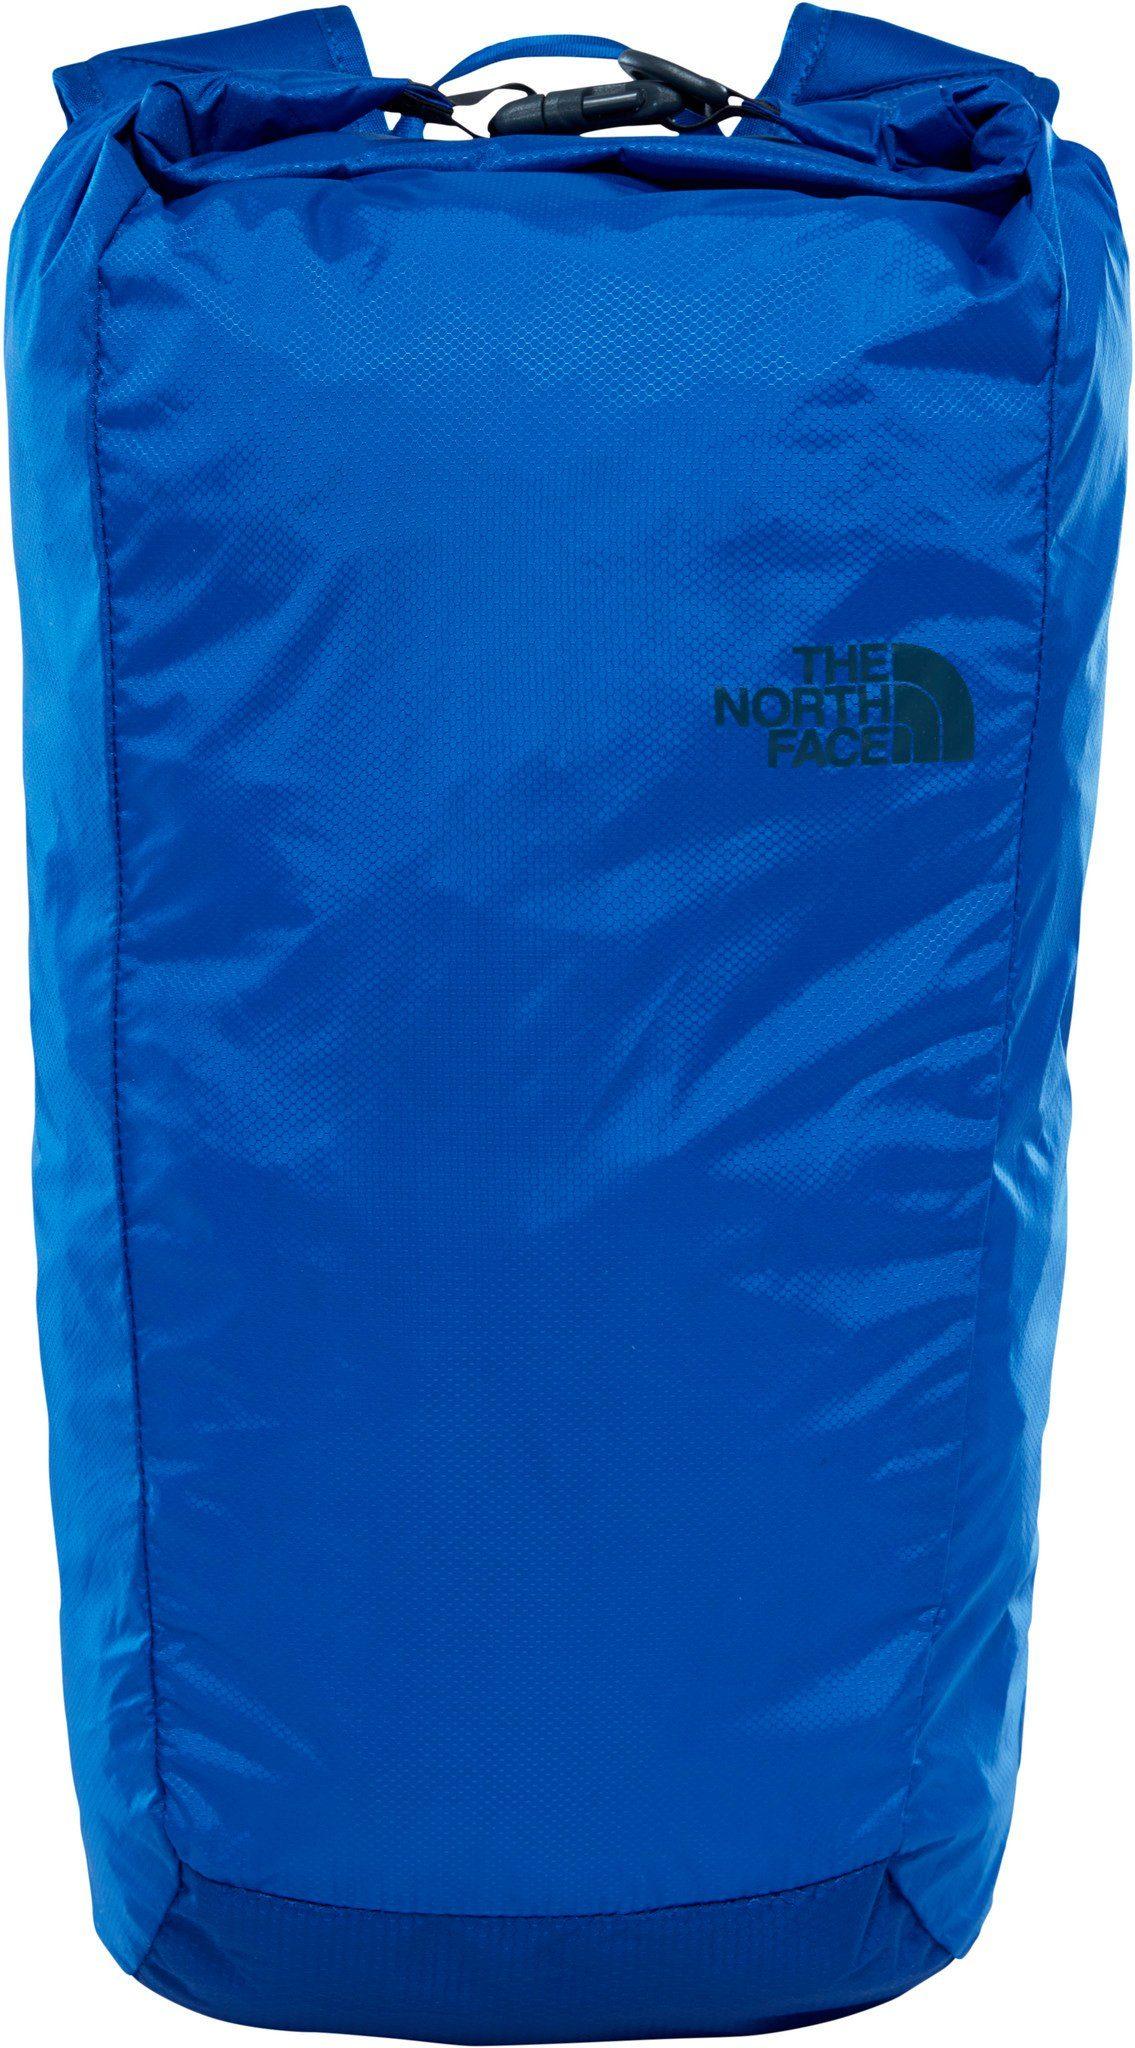 The North Face Wanderrucksack »Flyweight Rolltop Backpack«